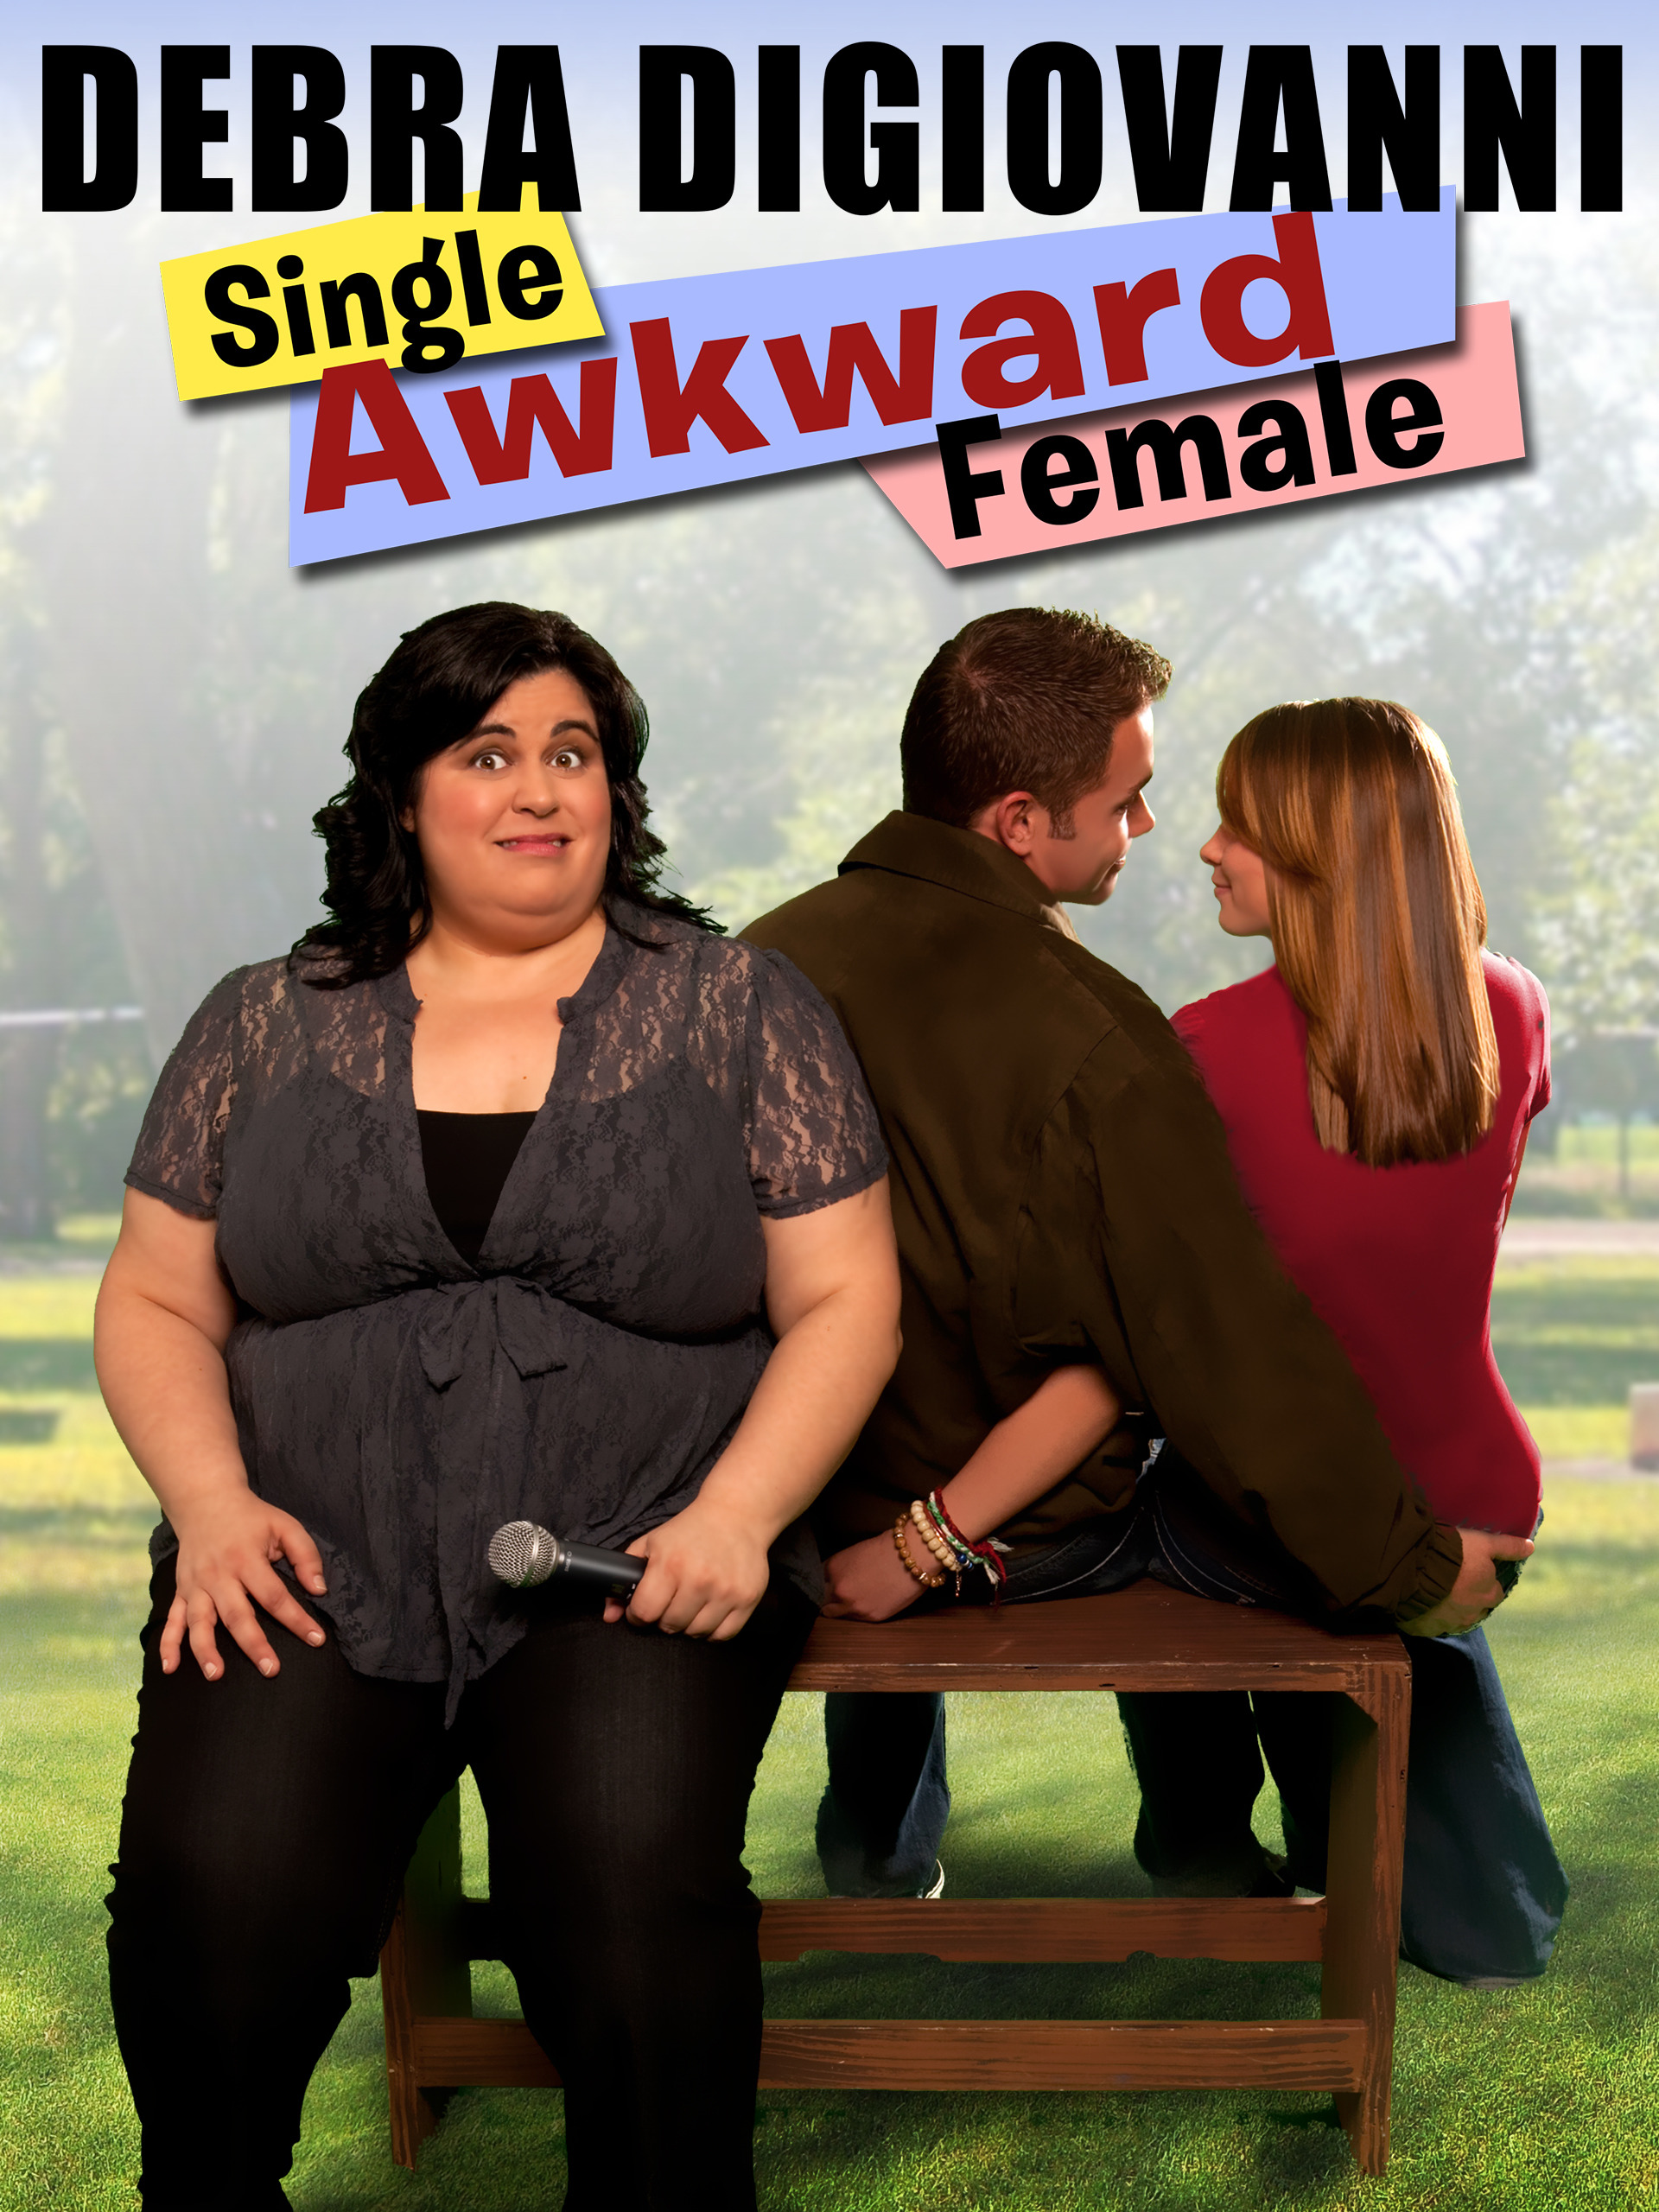 single kvinne